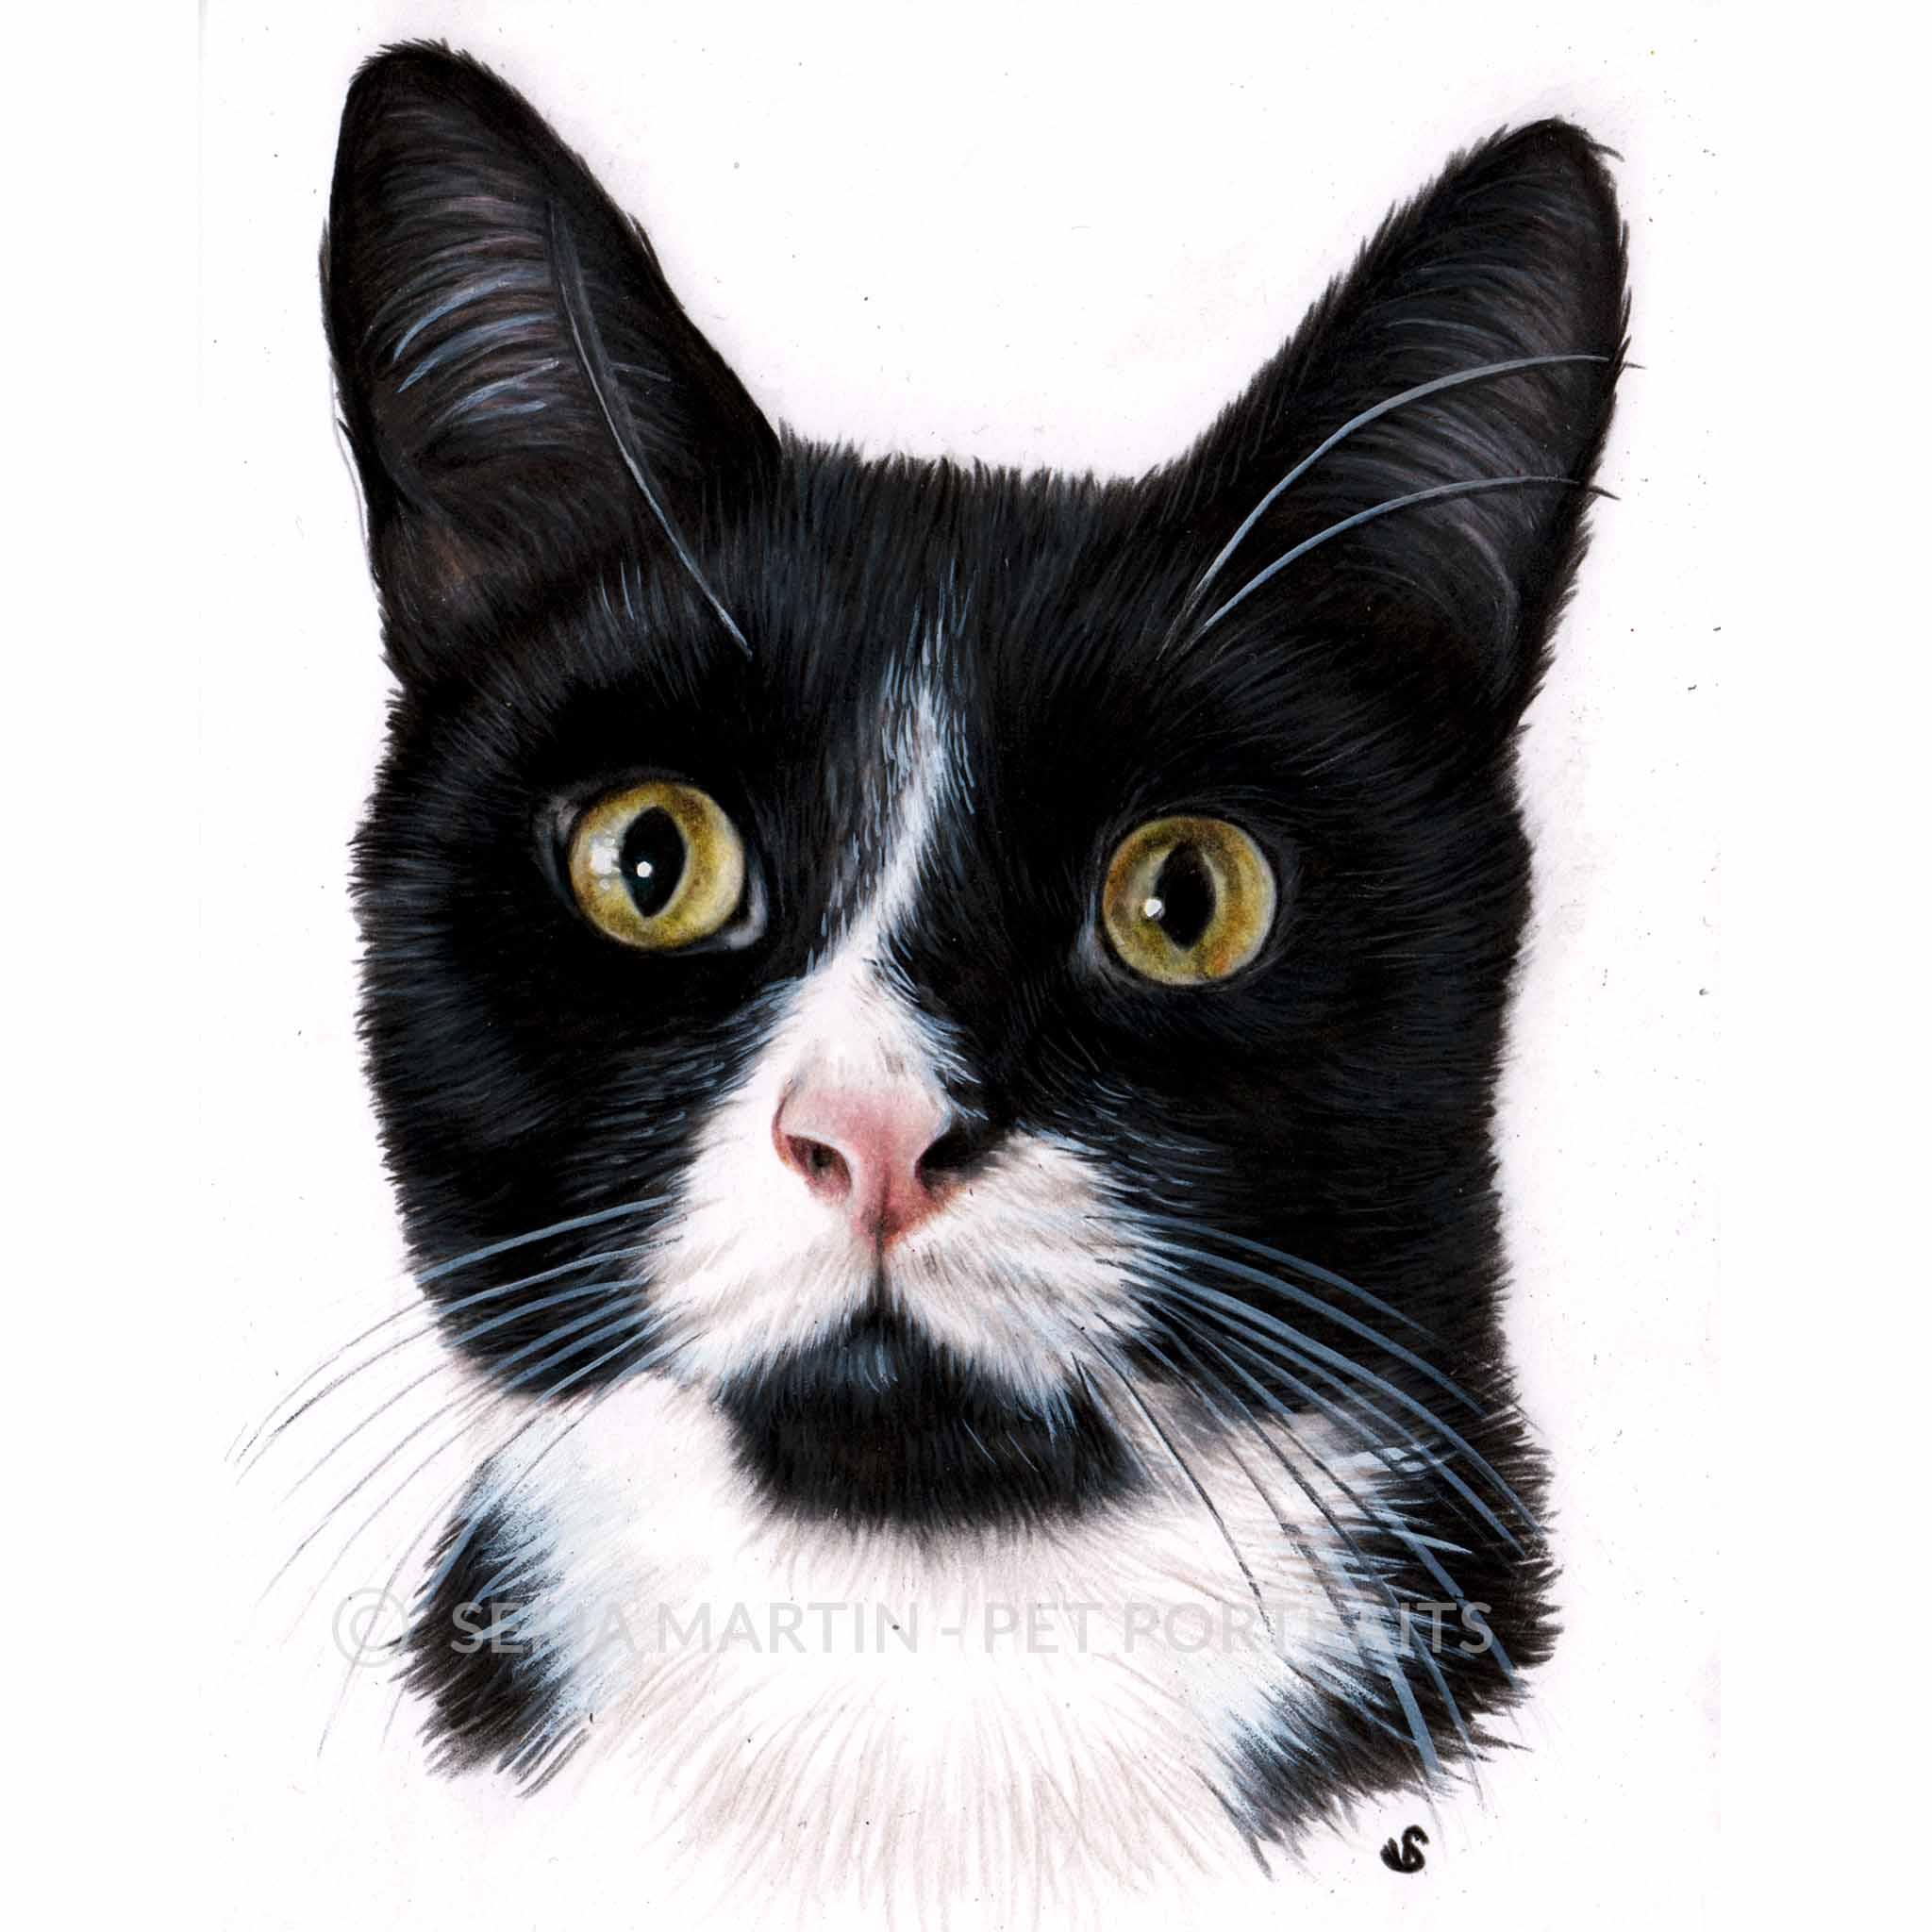 'Freddie' - UK, 5.8 x 8.3 inches, 2018, Colour Pencil Cat Portrait by Sema Martin